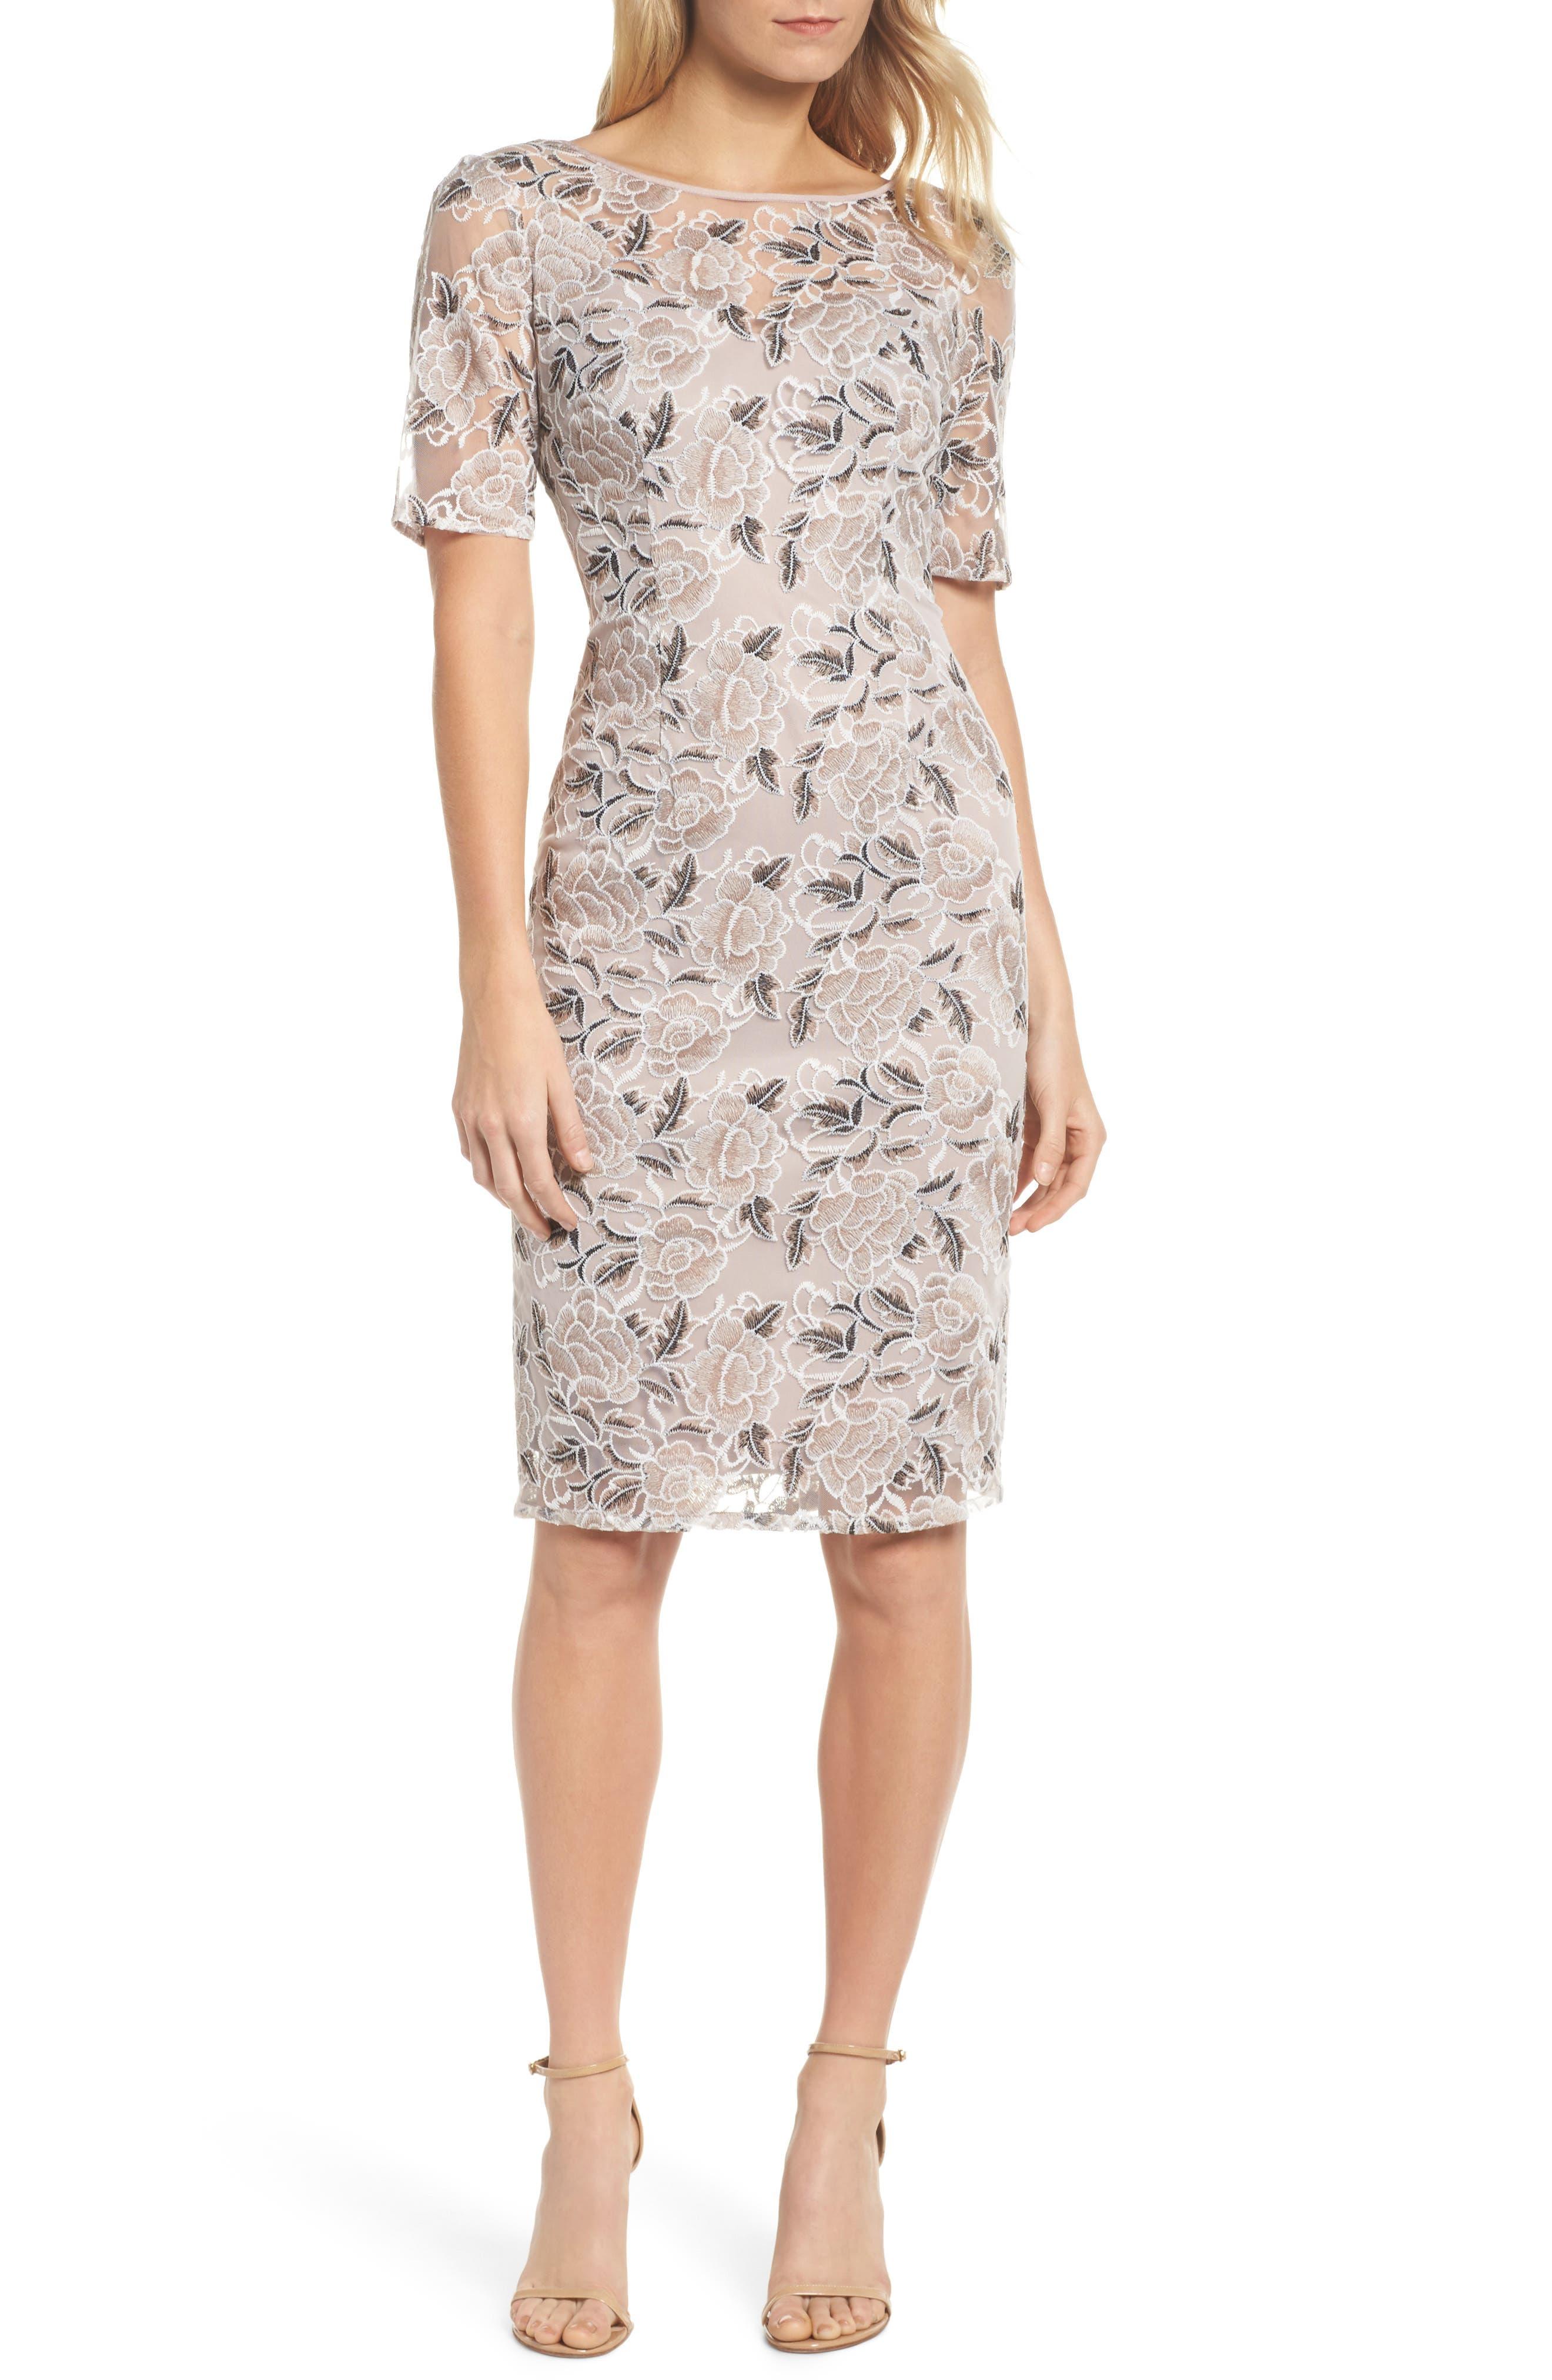 Alternate Image 1 Selected - Adrianna Papell Suzette Embroidered Sheath Dress (Regular & Petite)